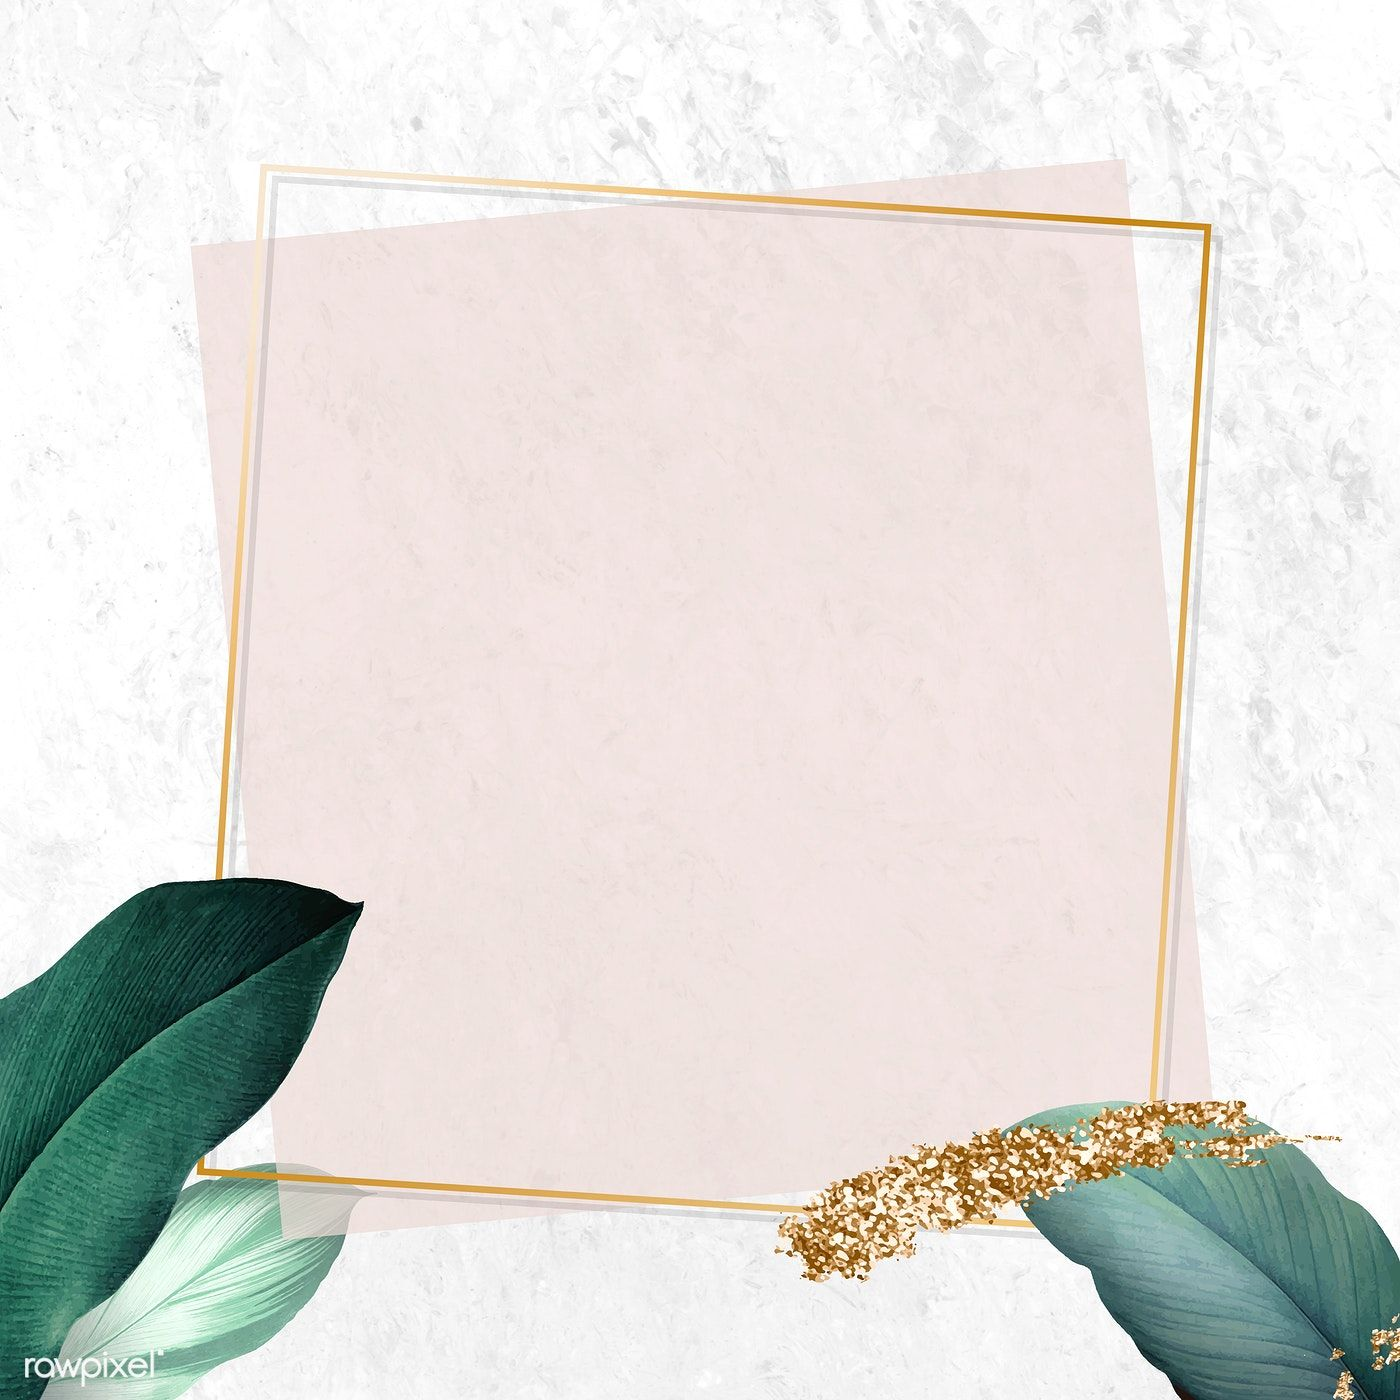 Leafy giveaway frame social media banner vector with shimmering gold tint | premium image by rawpixel.com / NingZk V.